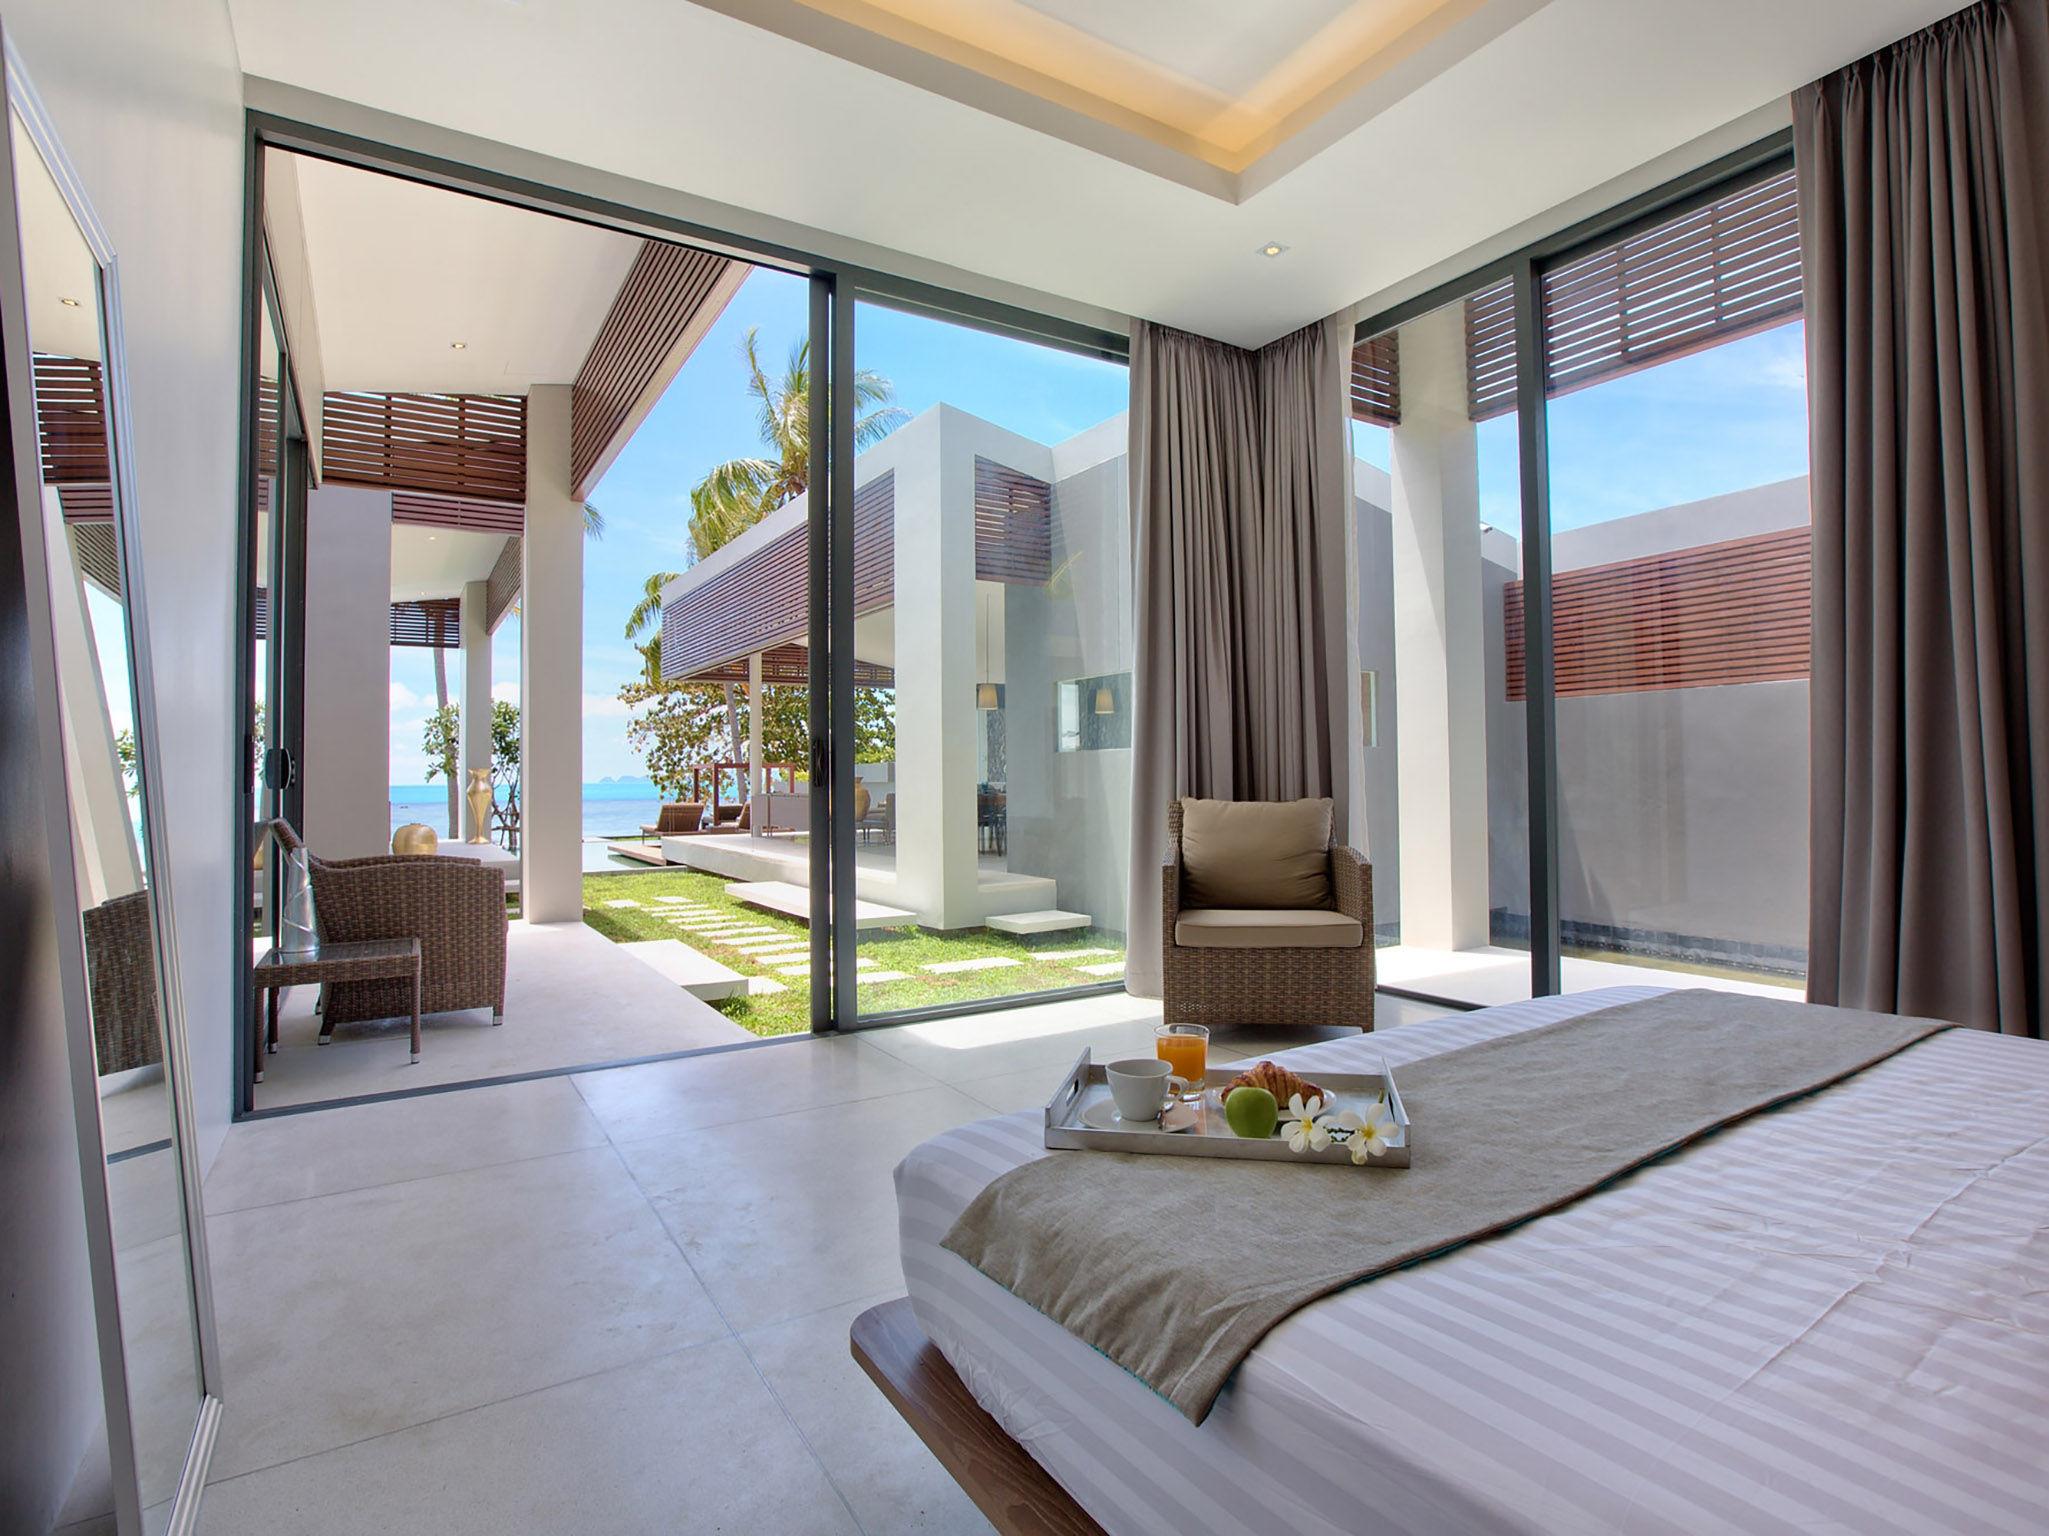 Villa Soong at Mandalay Beach Villas - Bedroom three with exquisite view